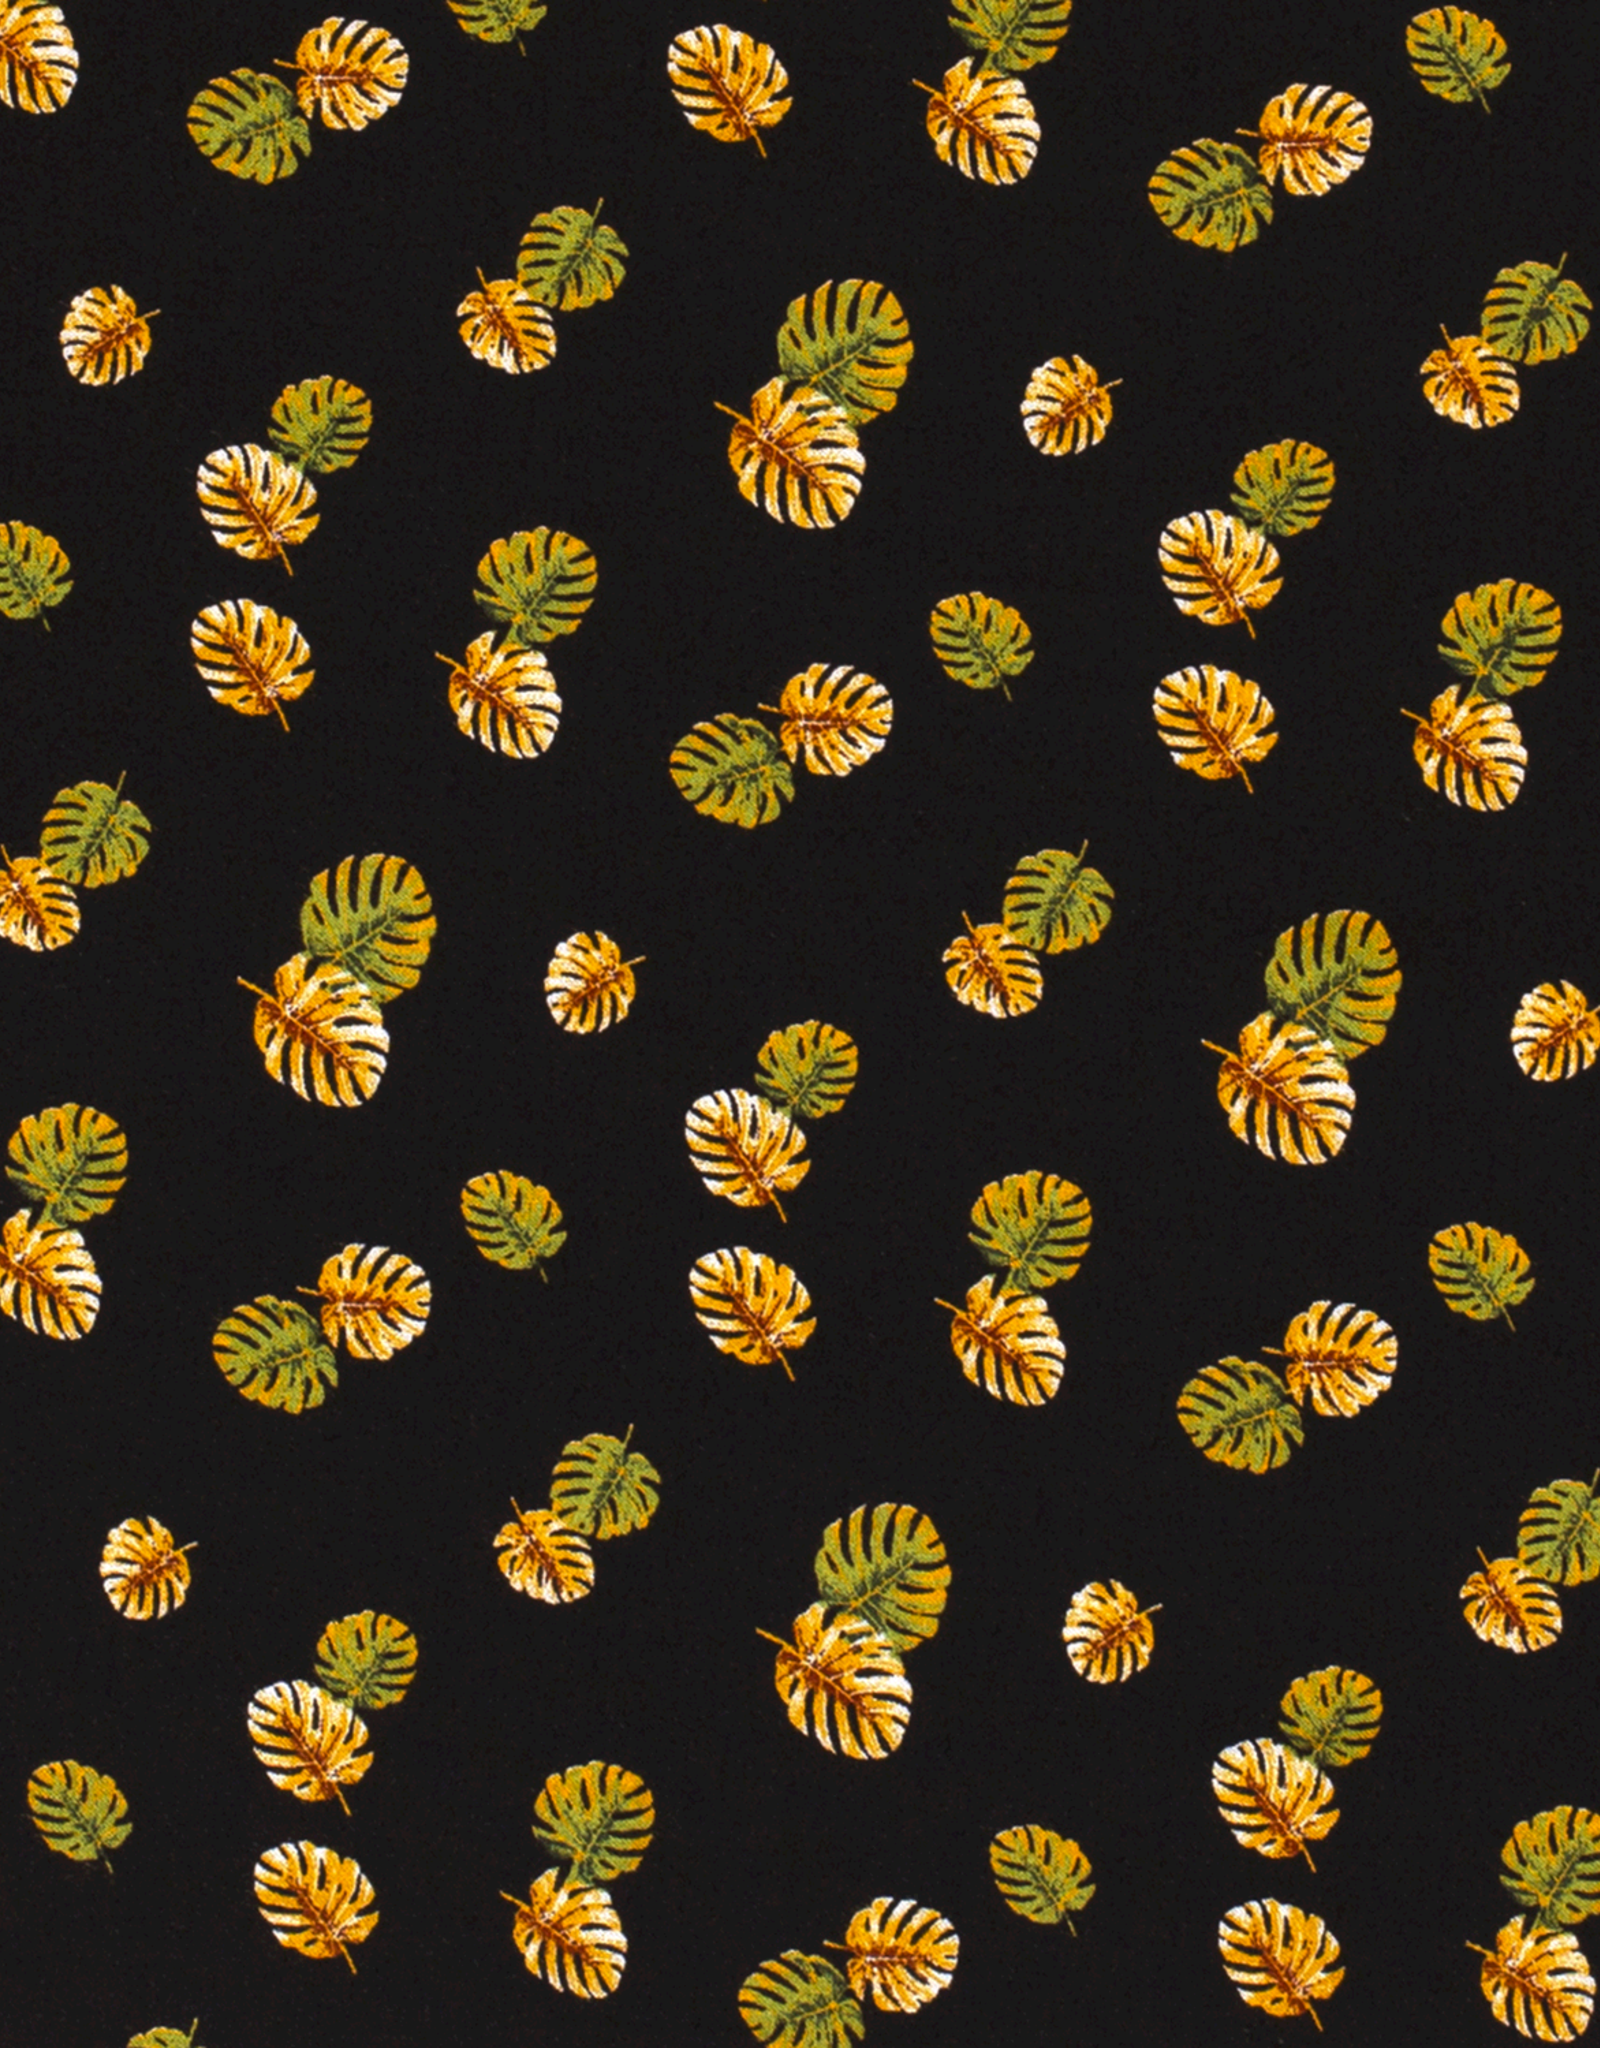 Viscose - Leaves